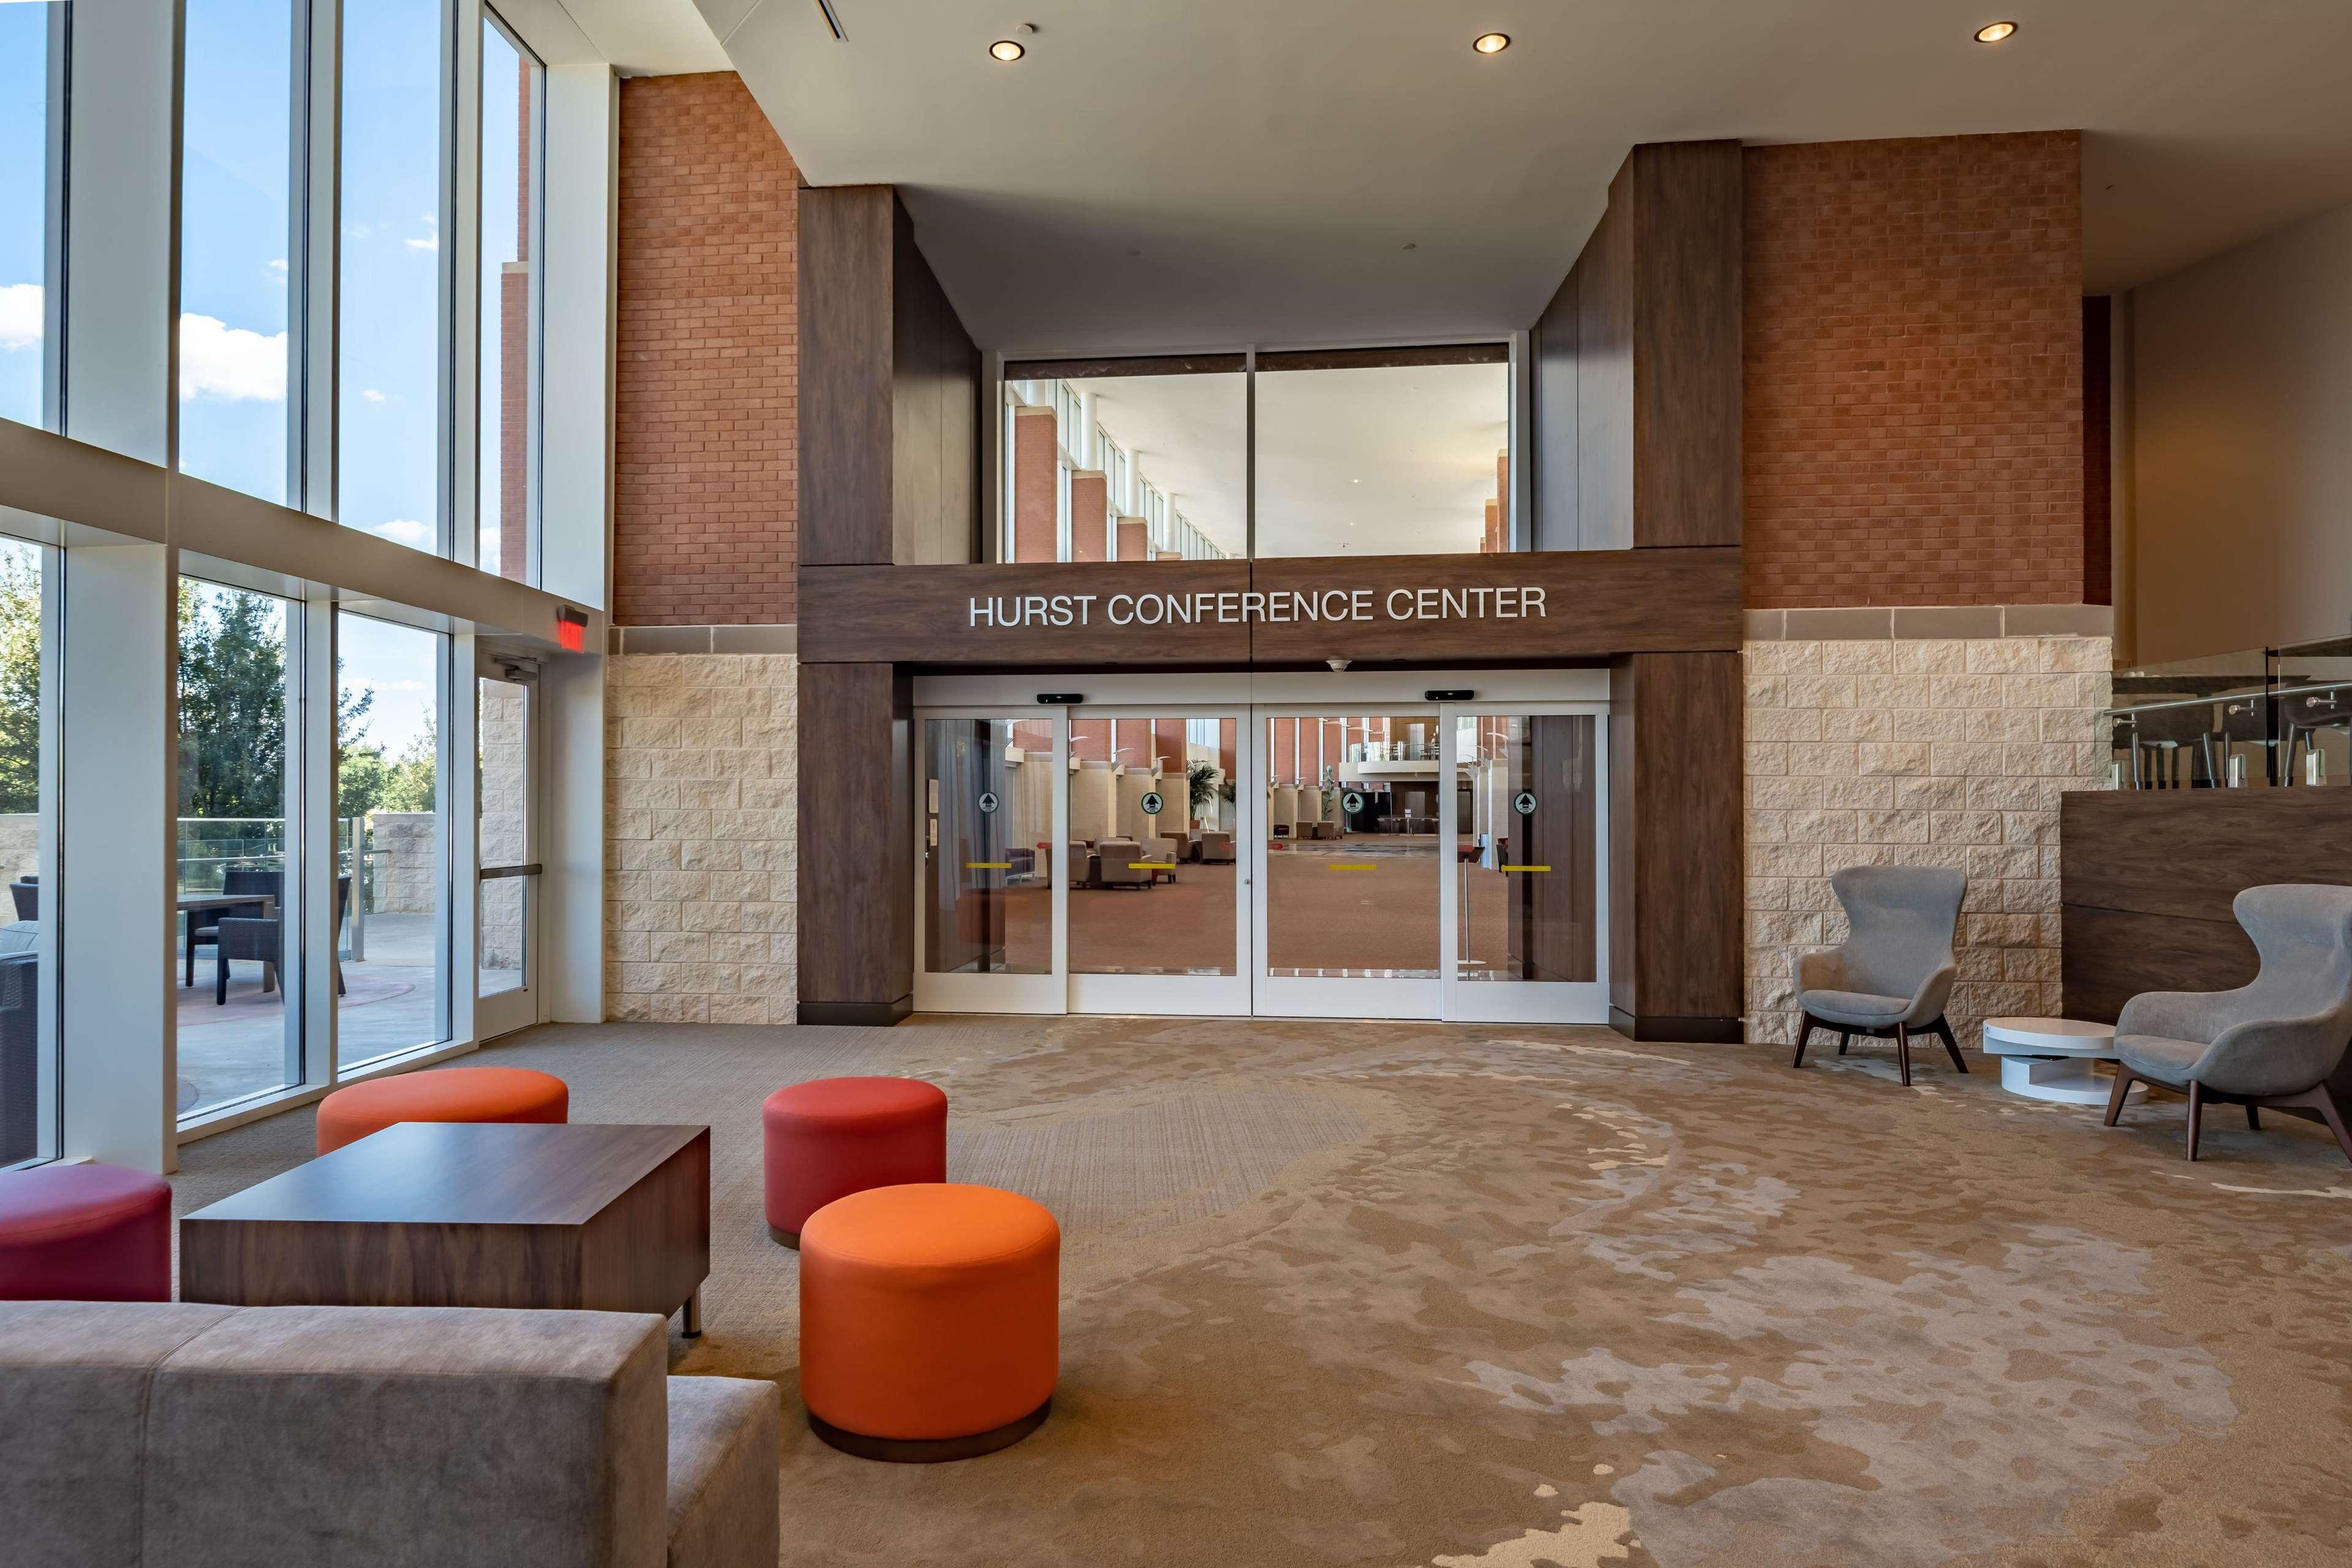 Hilton Garden Inn Dallas at Hurst Conference Center image 9